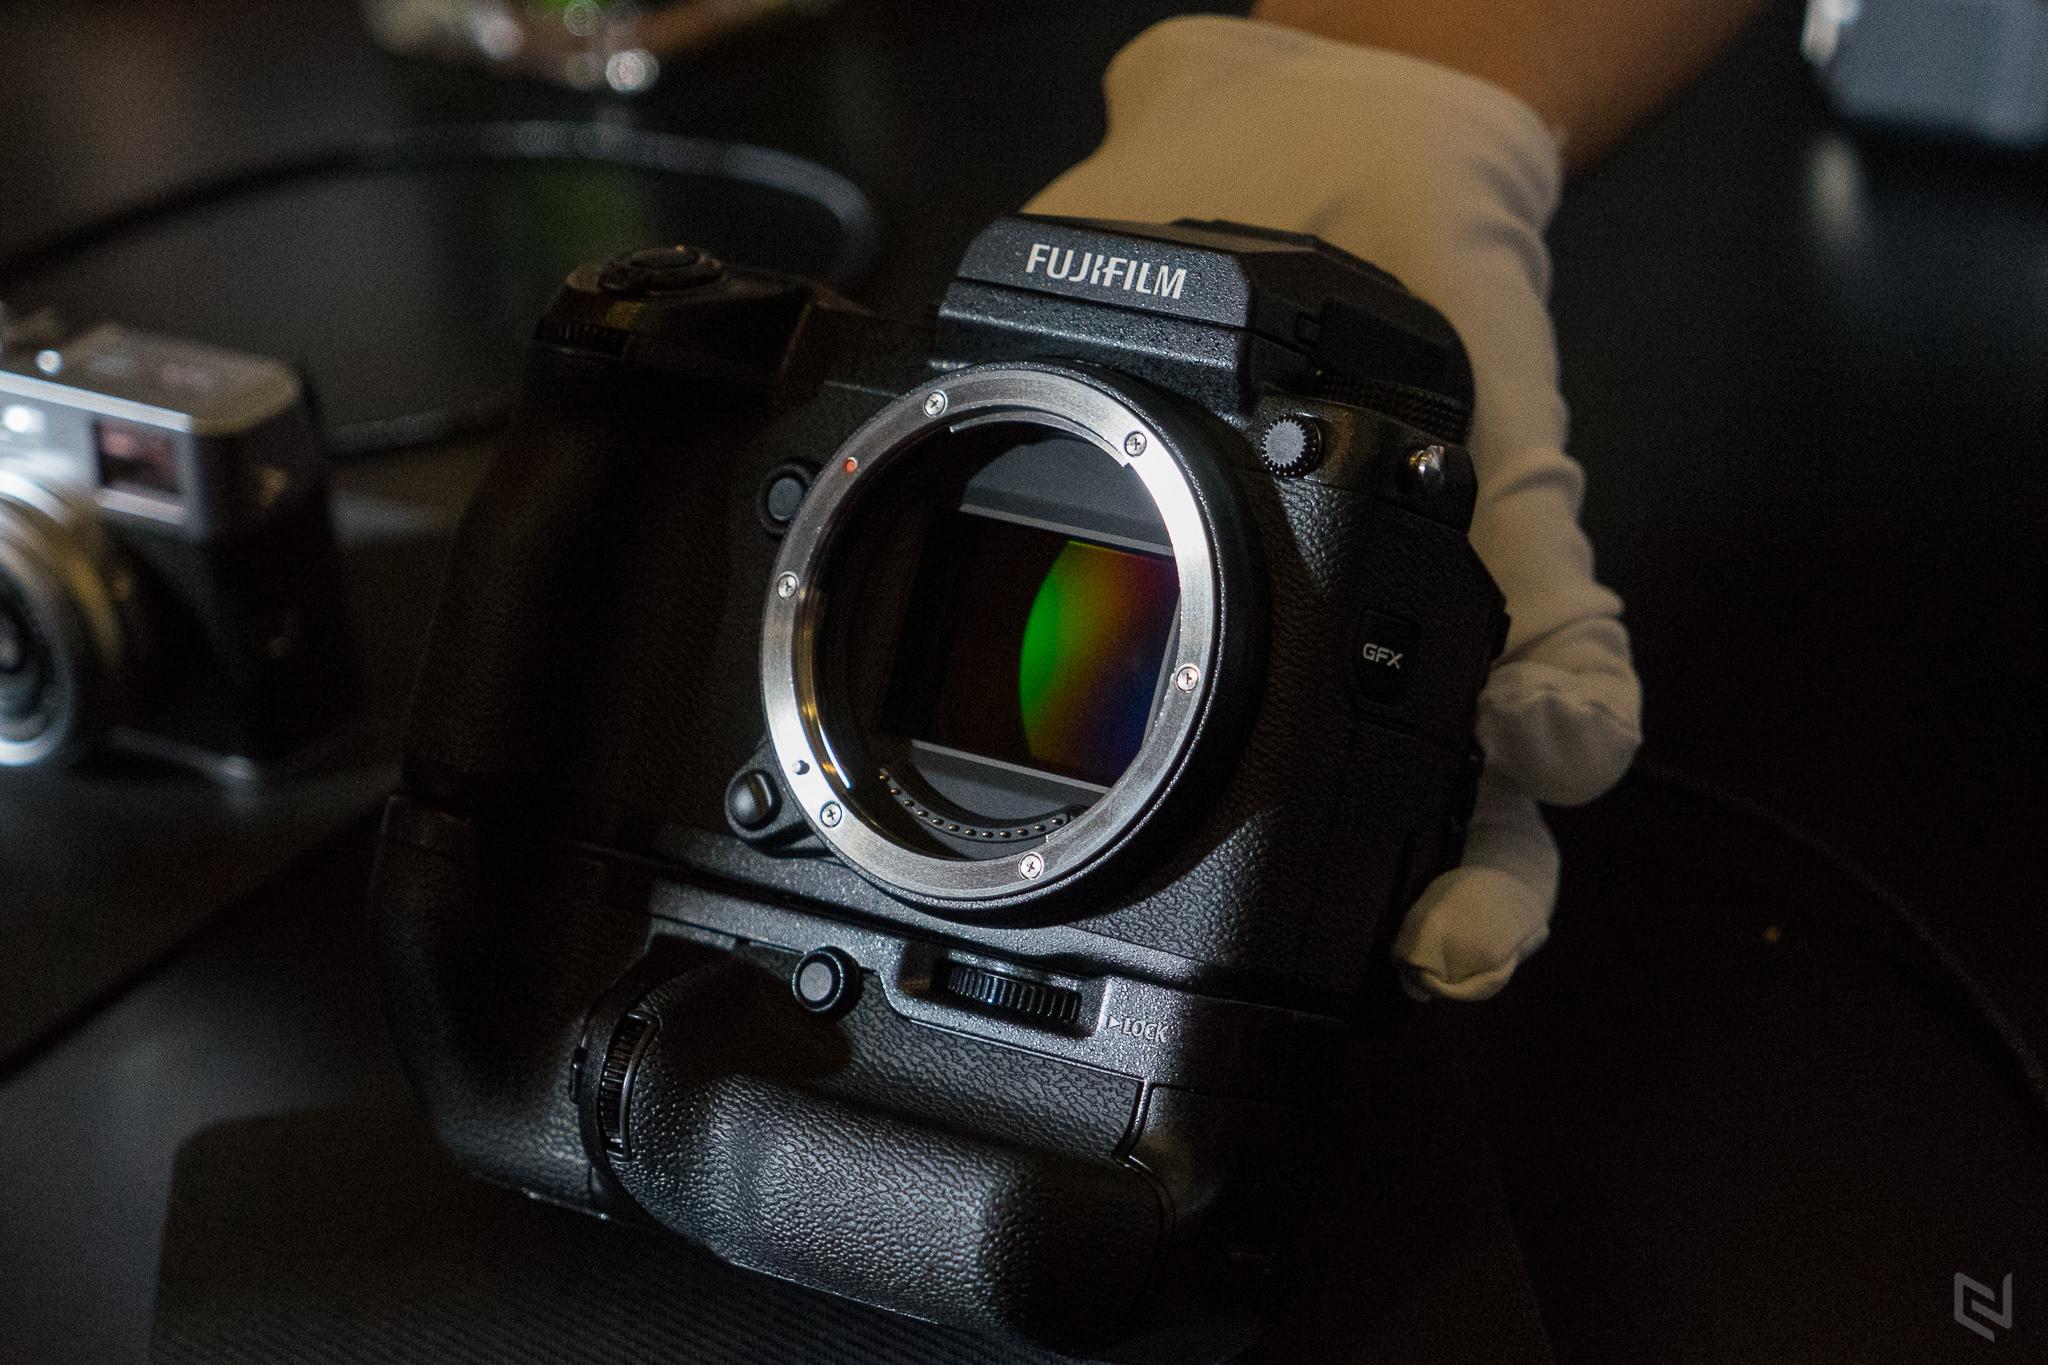 Fujifilm ra mắt máy ảnh Mirrorless cảm biến Medium Format GFX 50S tại VN